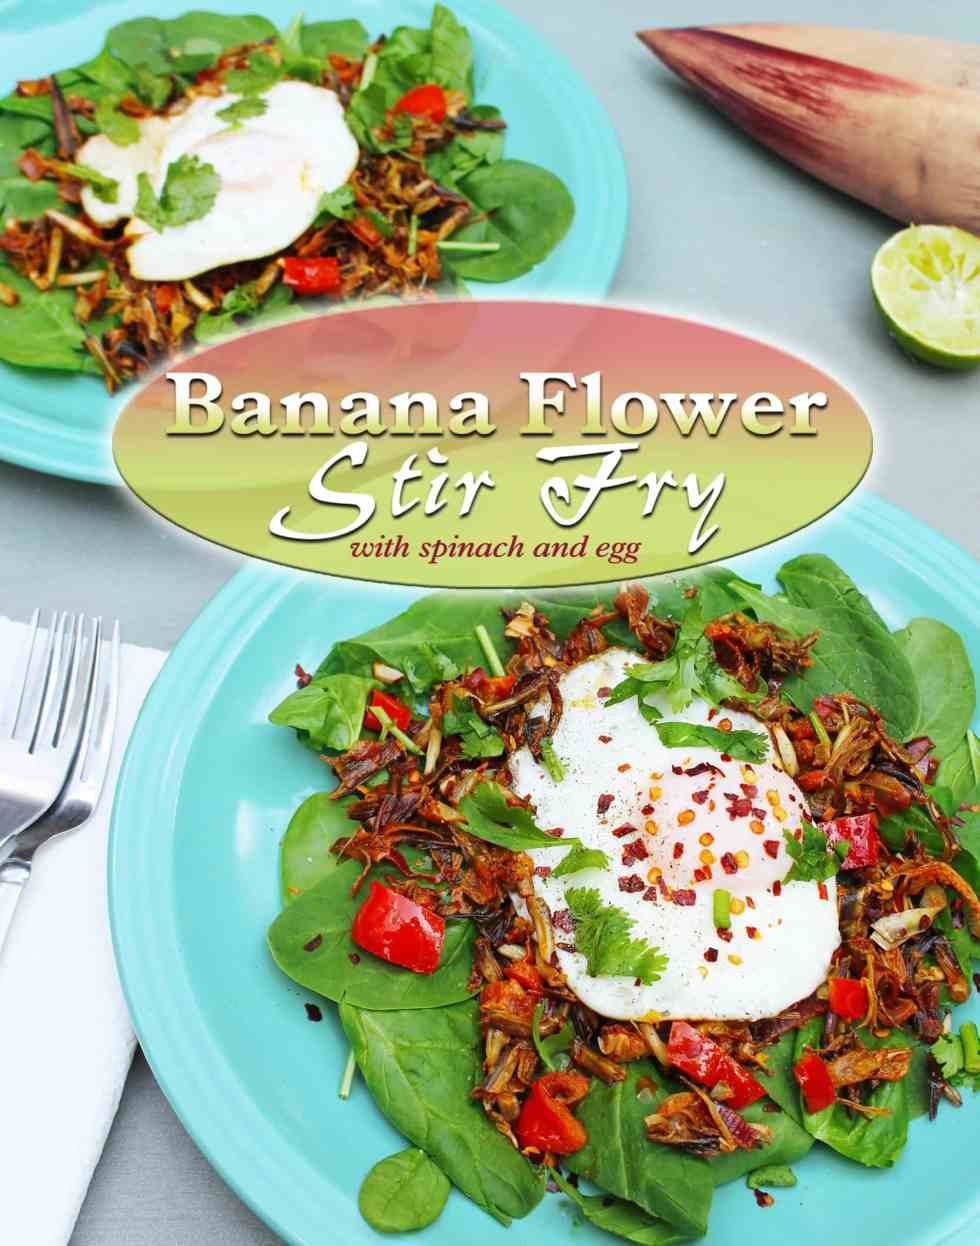 banana flower stir fry served with salad